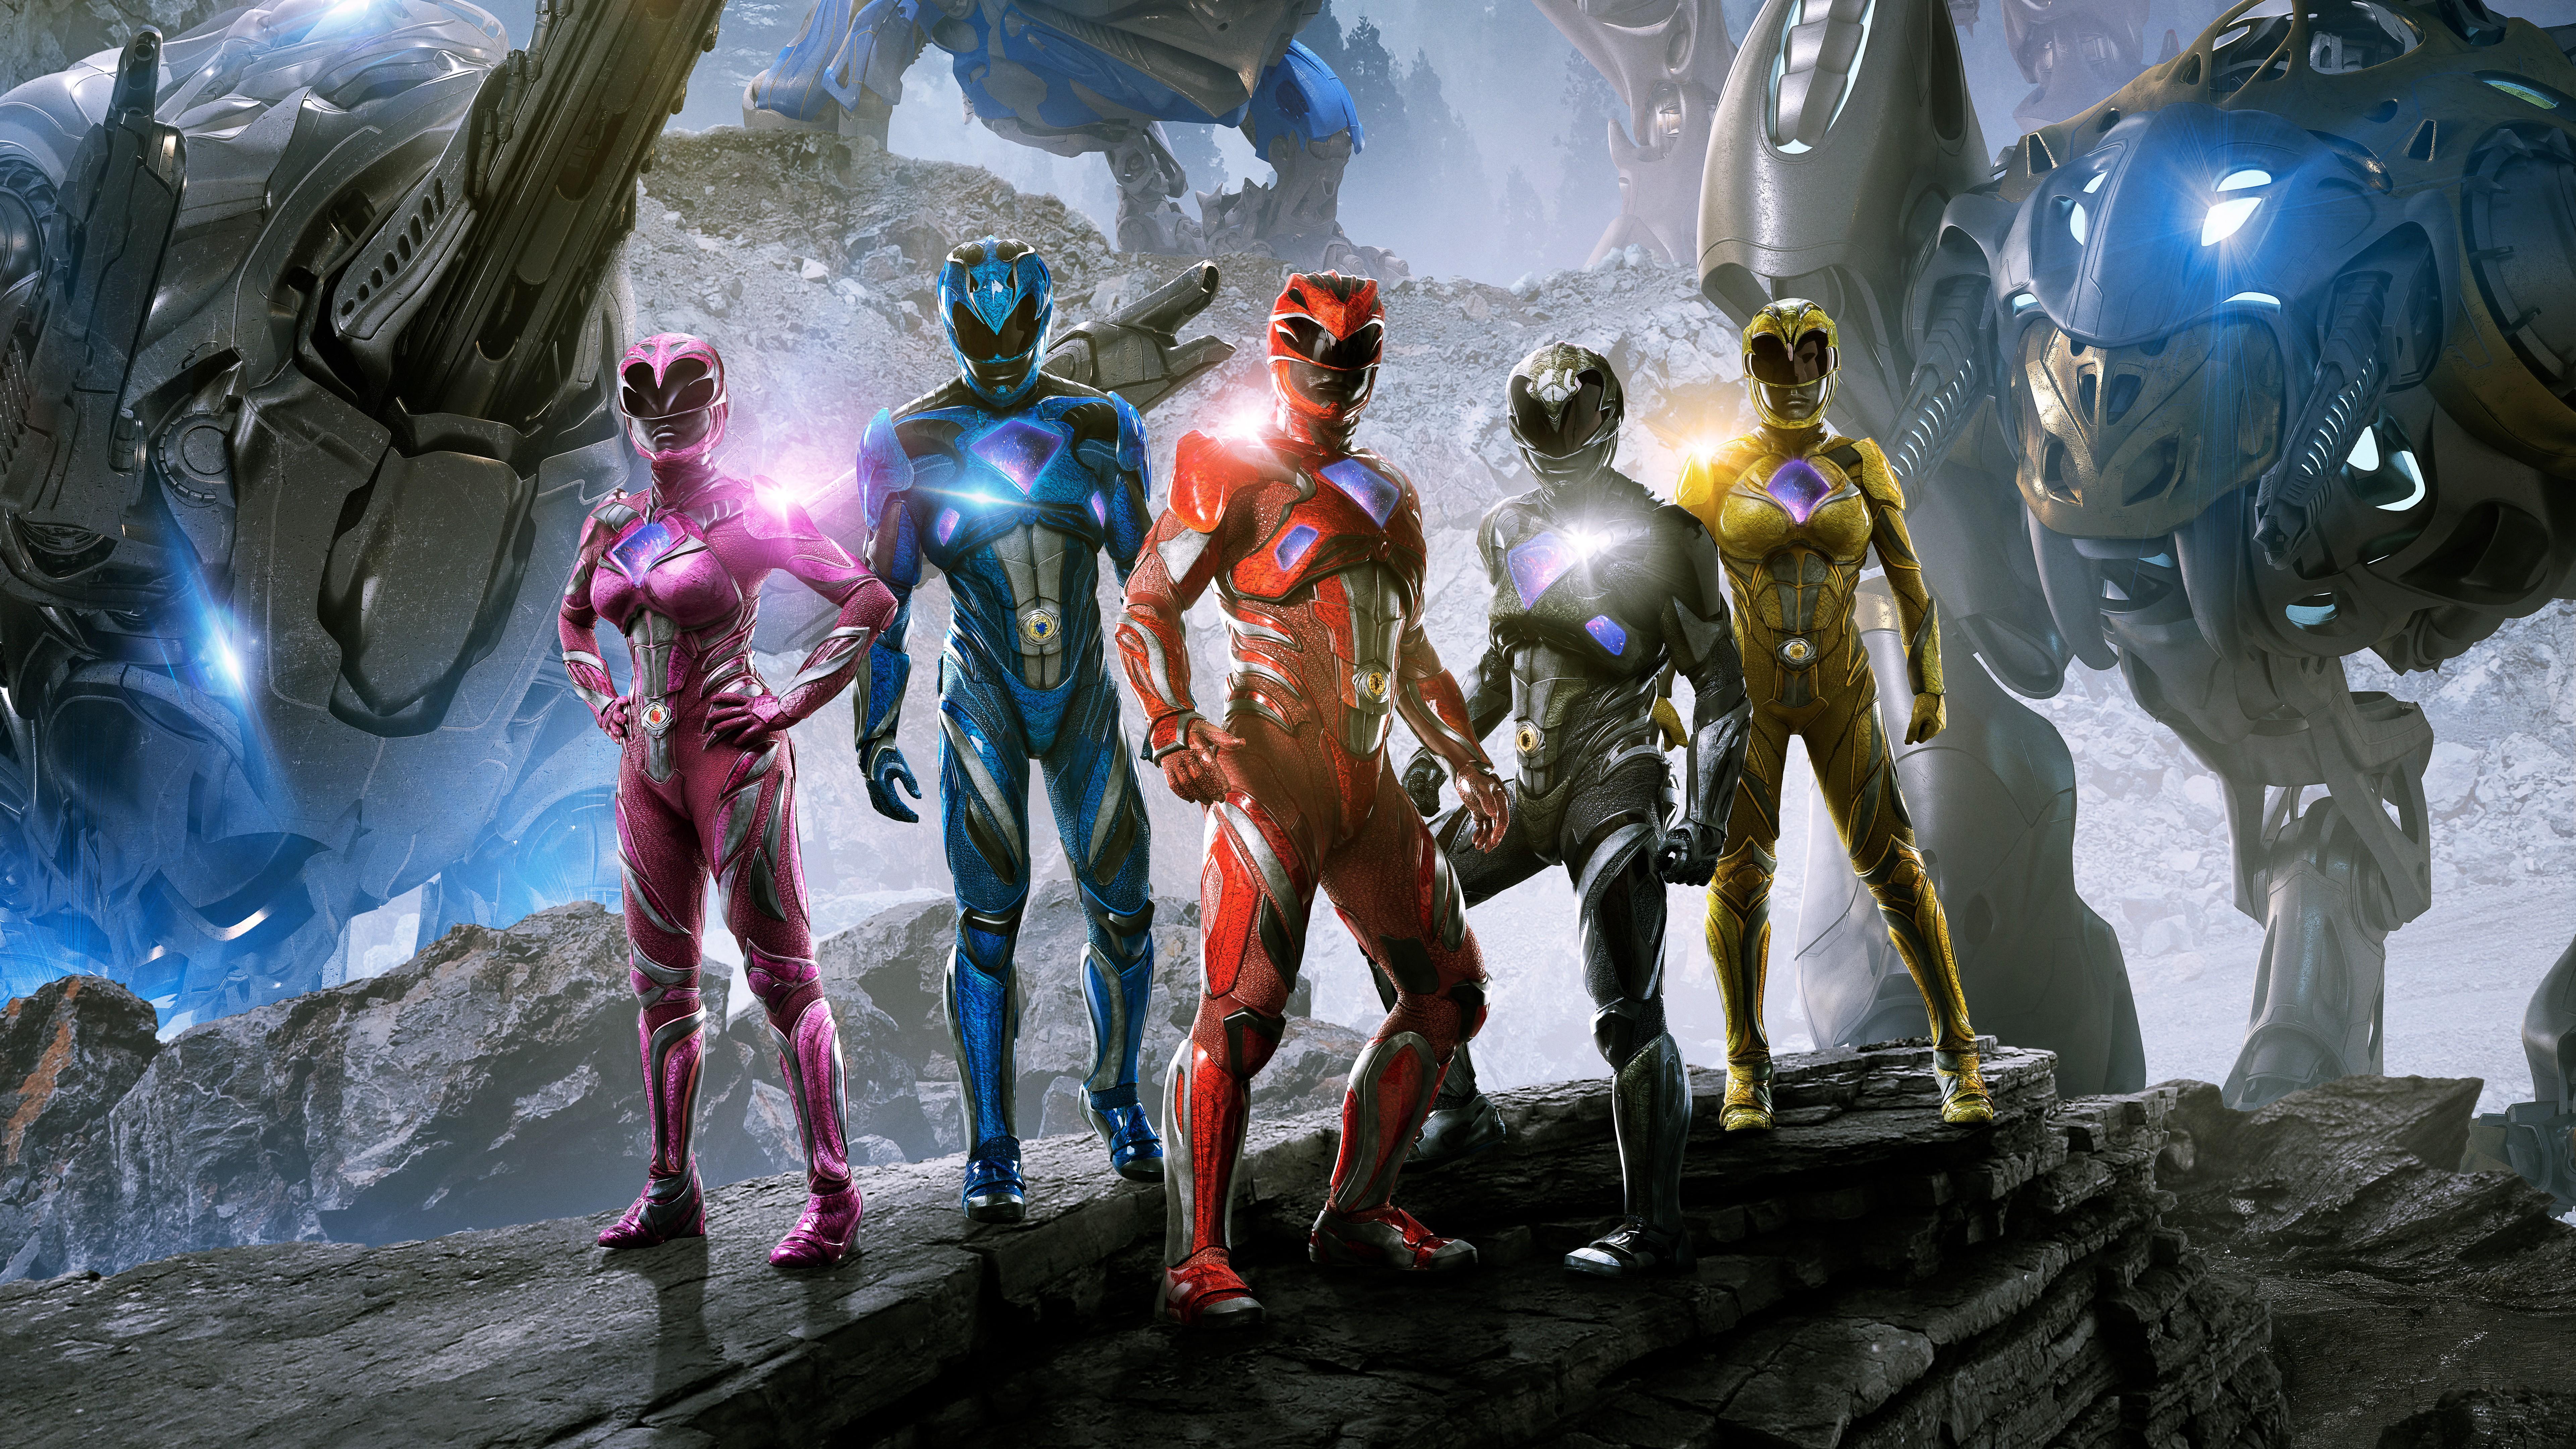 Power Rangers 2017 4k 8k   Power Rangers Wallpaper Hd 23924 7680x4320